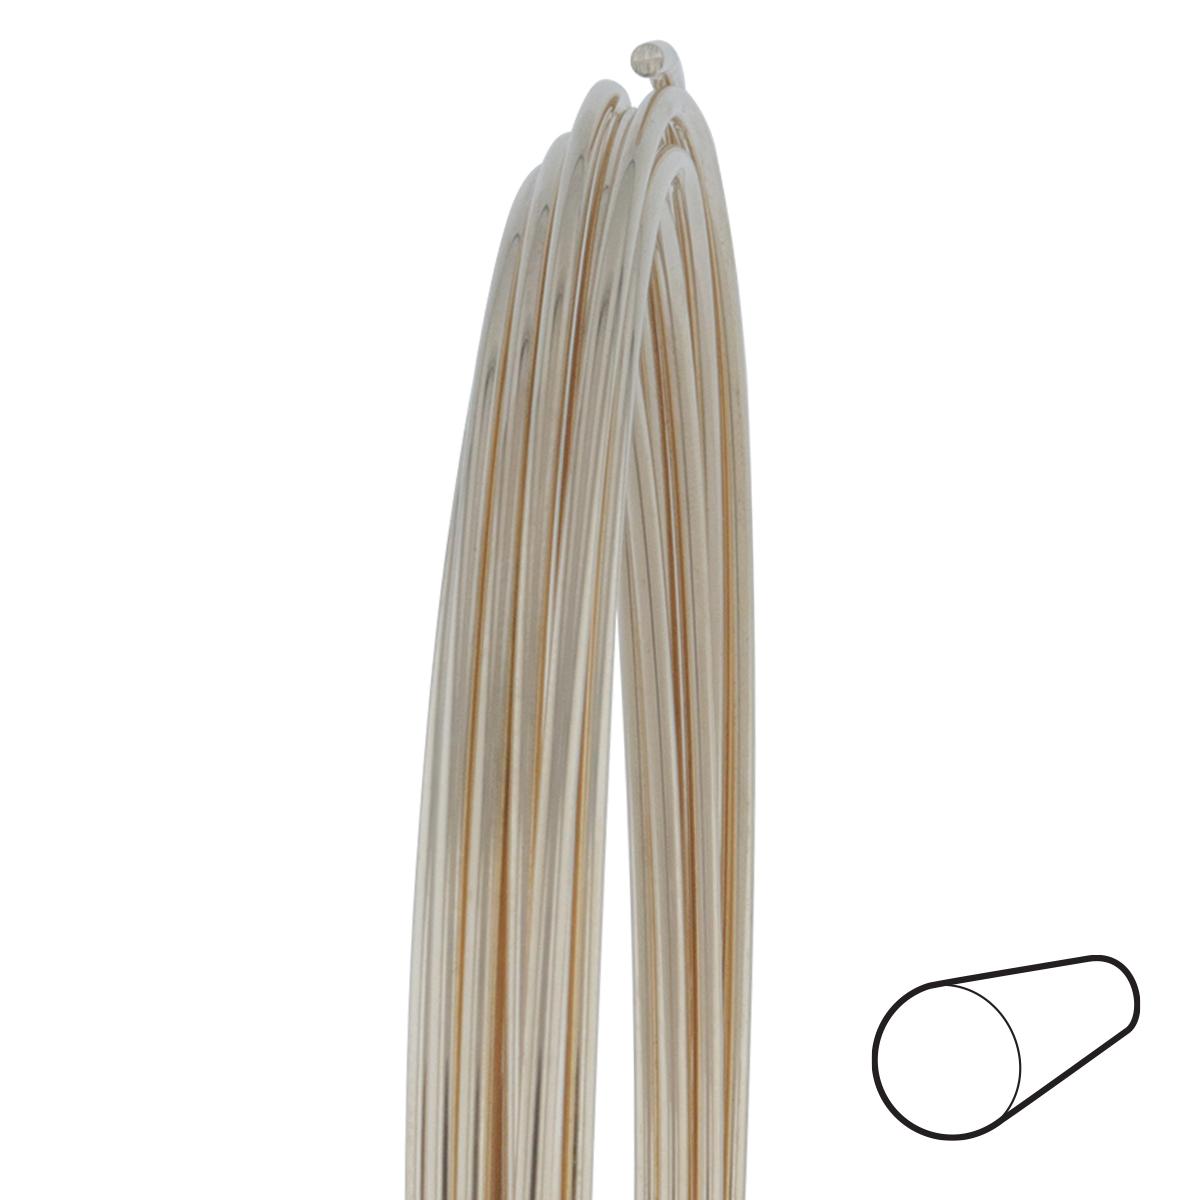 8 Gauge Round Dead Soft 14/20 Gold Filled Wire: Wire Jewelry   Wire ...